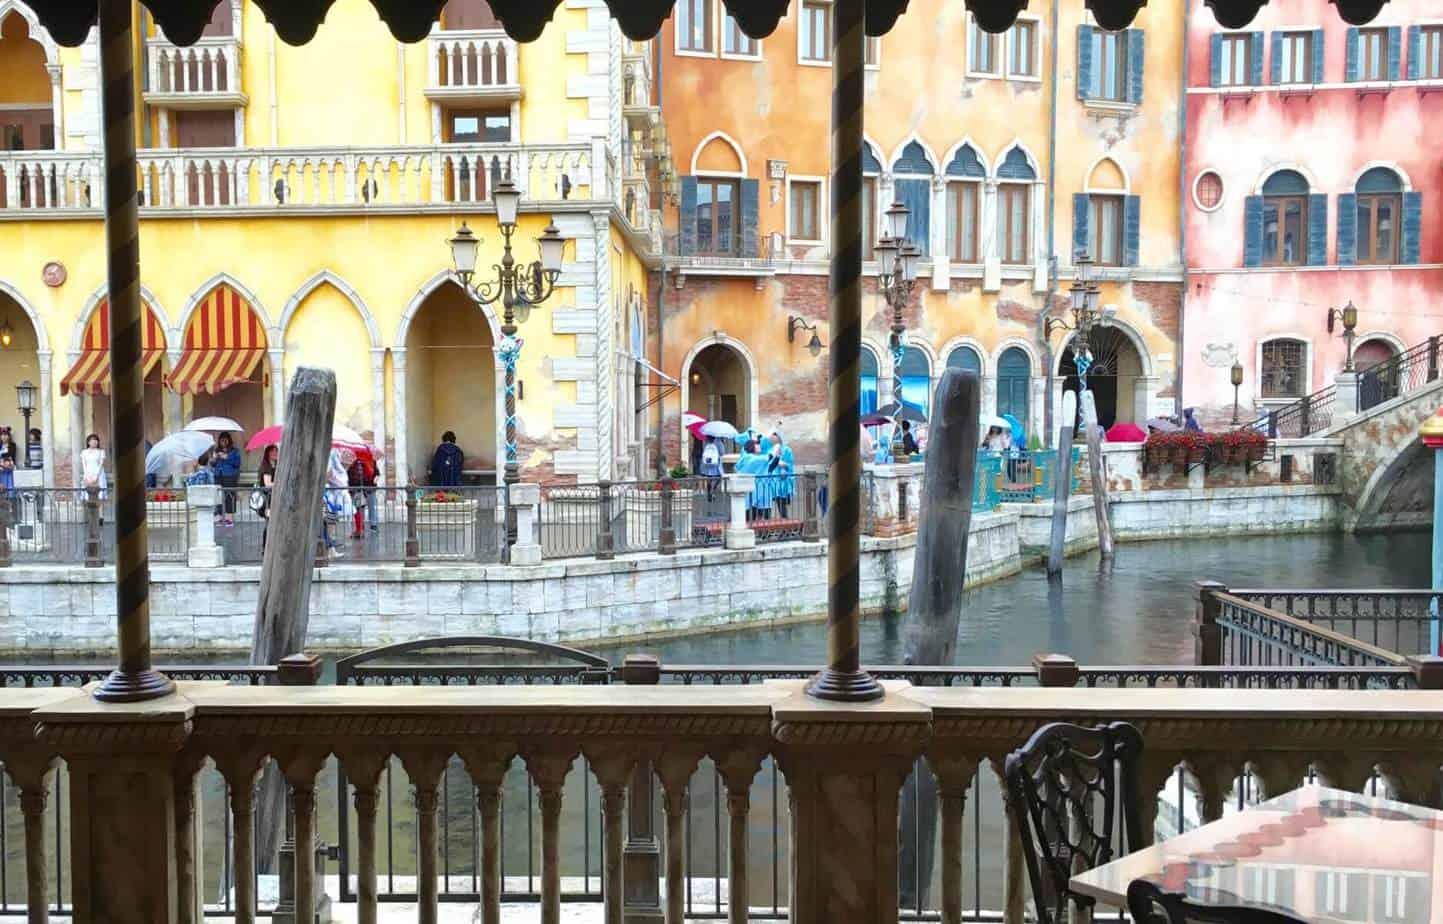 Ristorante Di Canaletto Tokyo DisneySea Outdoor Seating